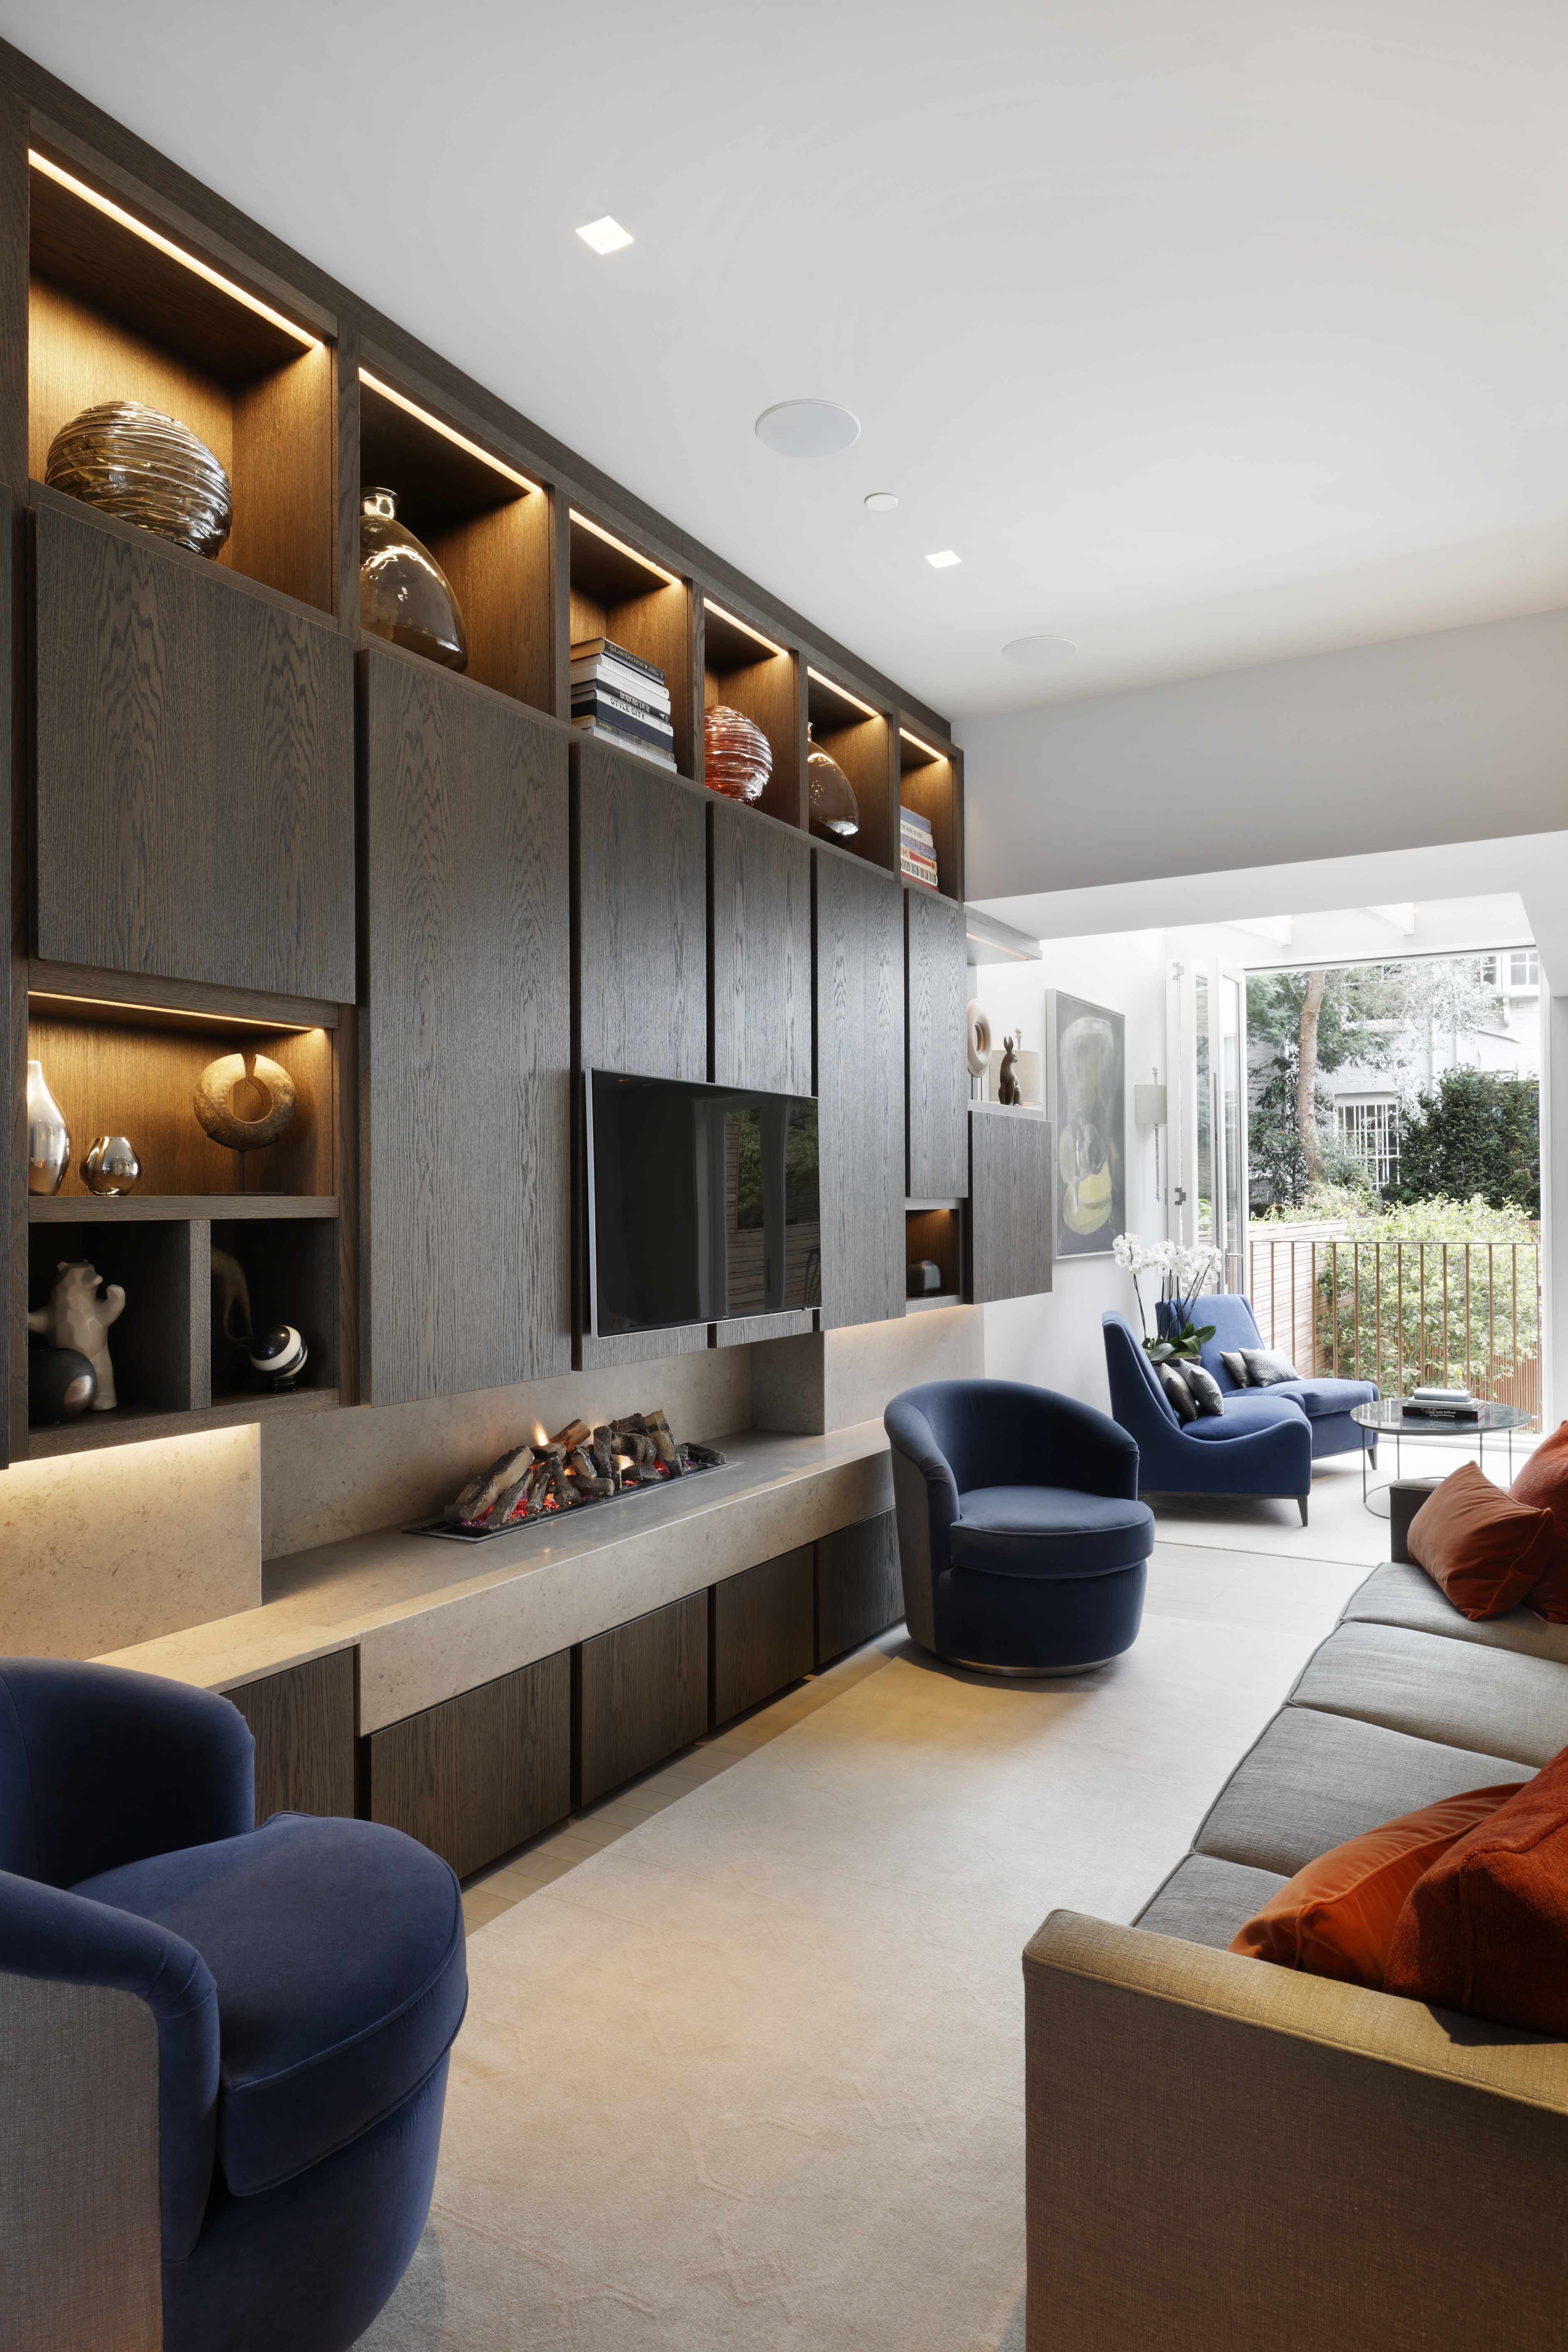 INTERIOR iD Reception in private house in